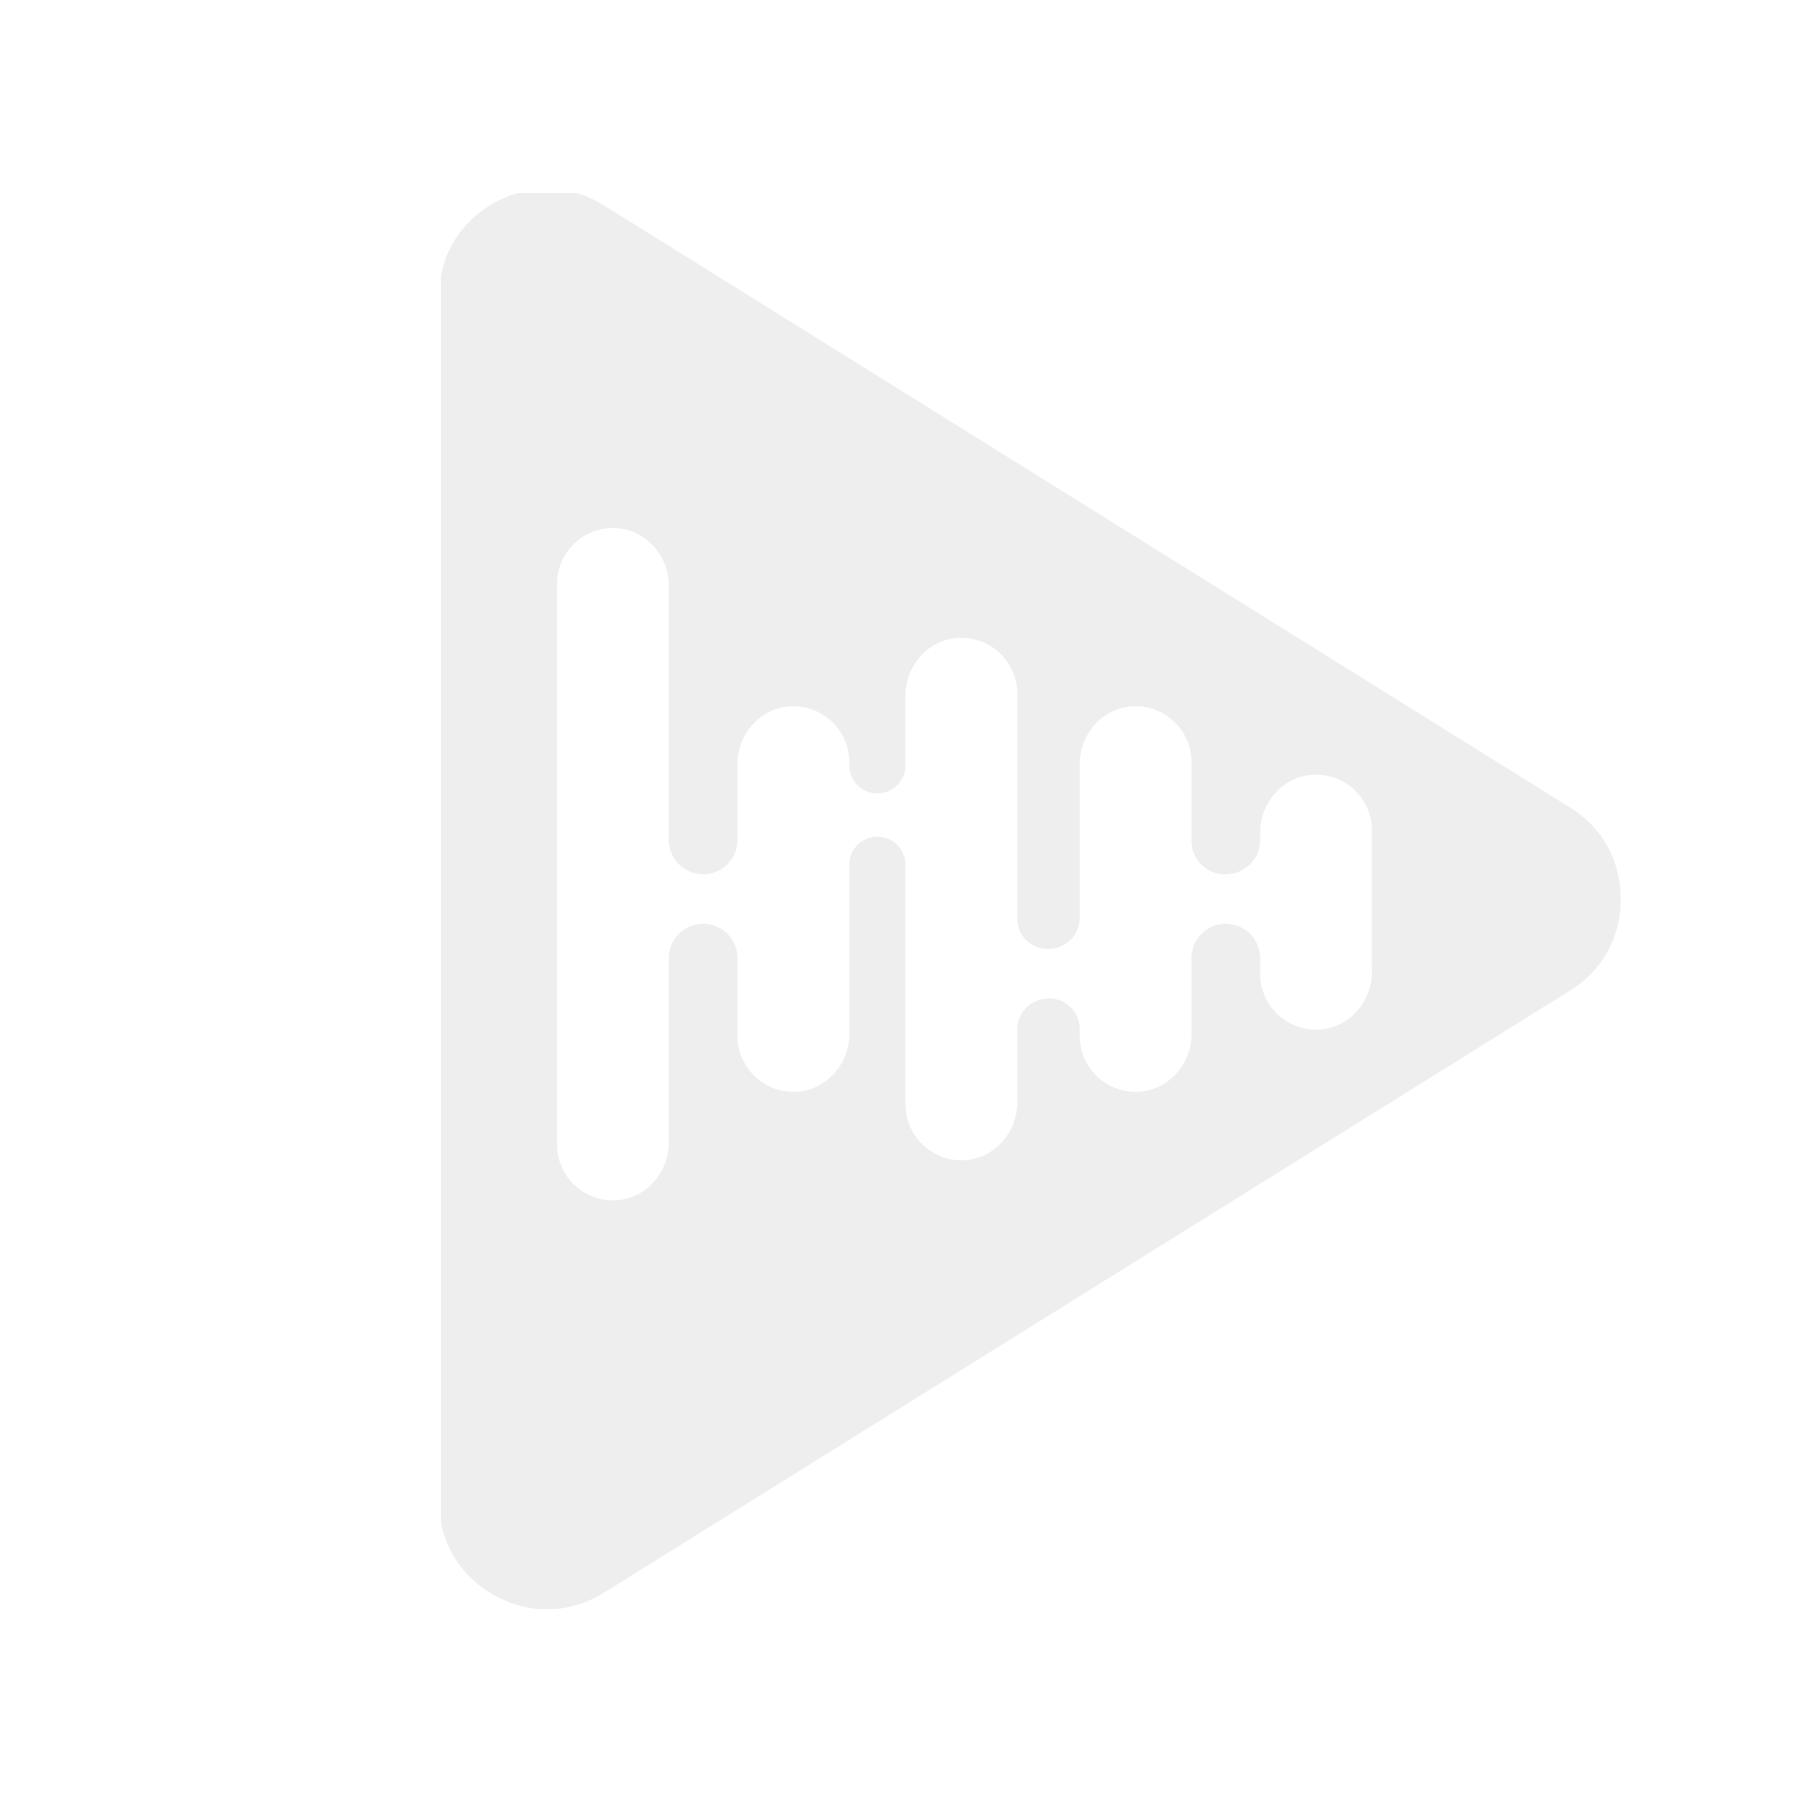 Metra CHTO-02-SWC